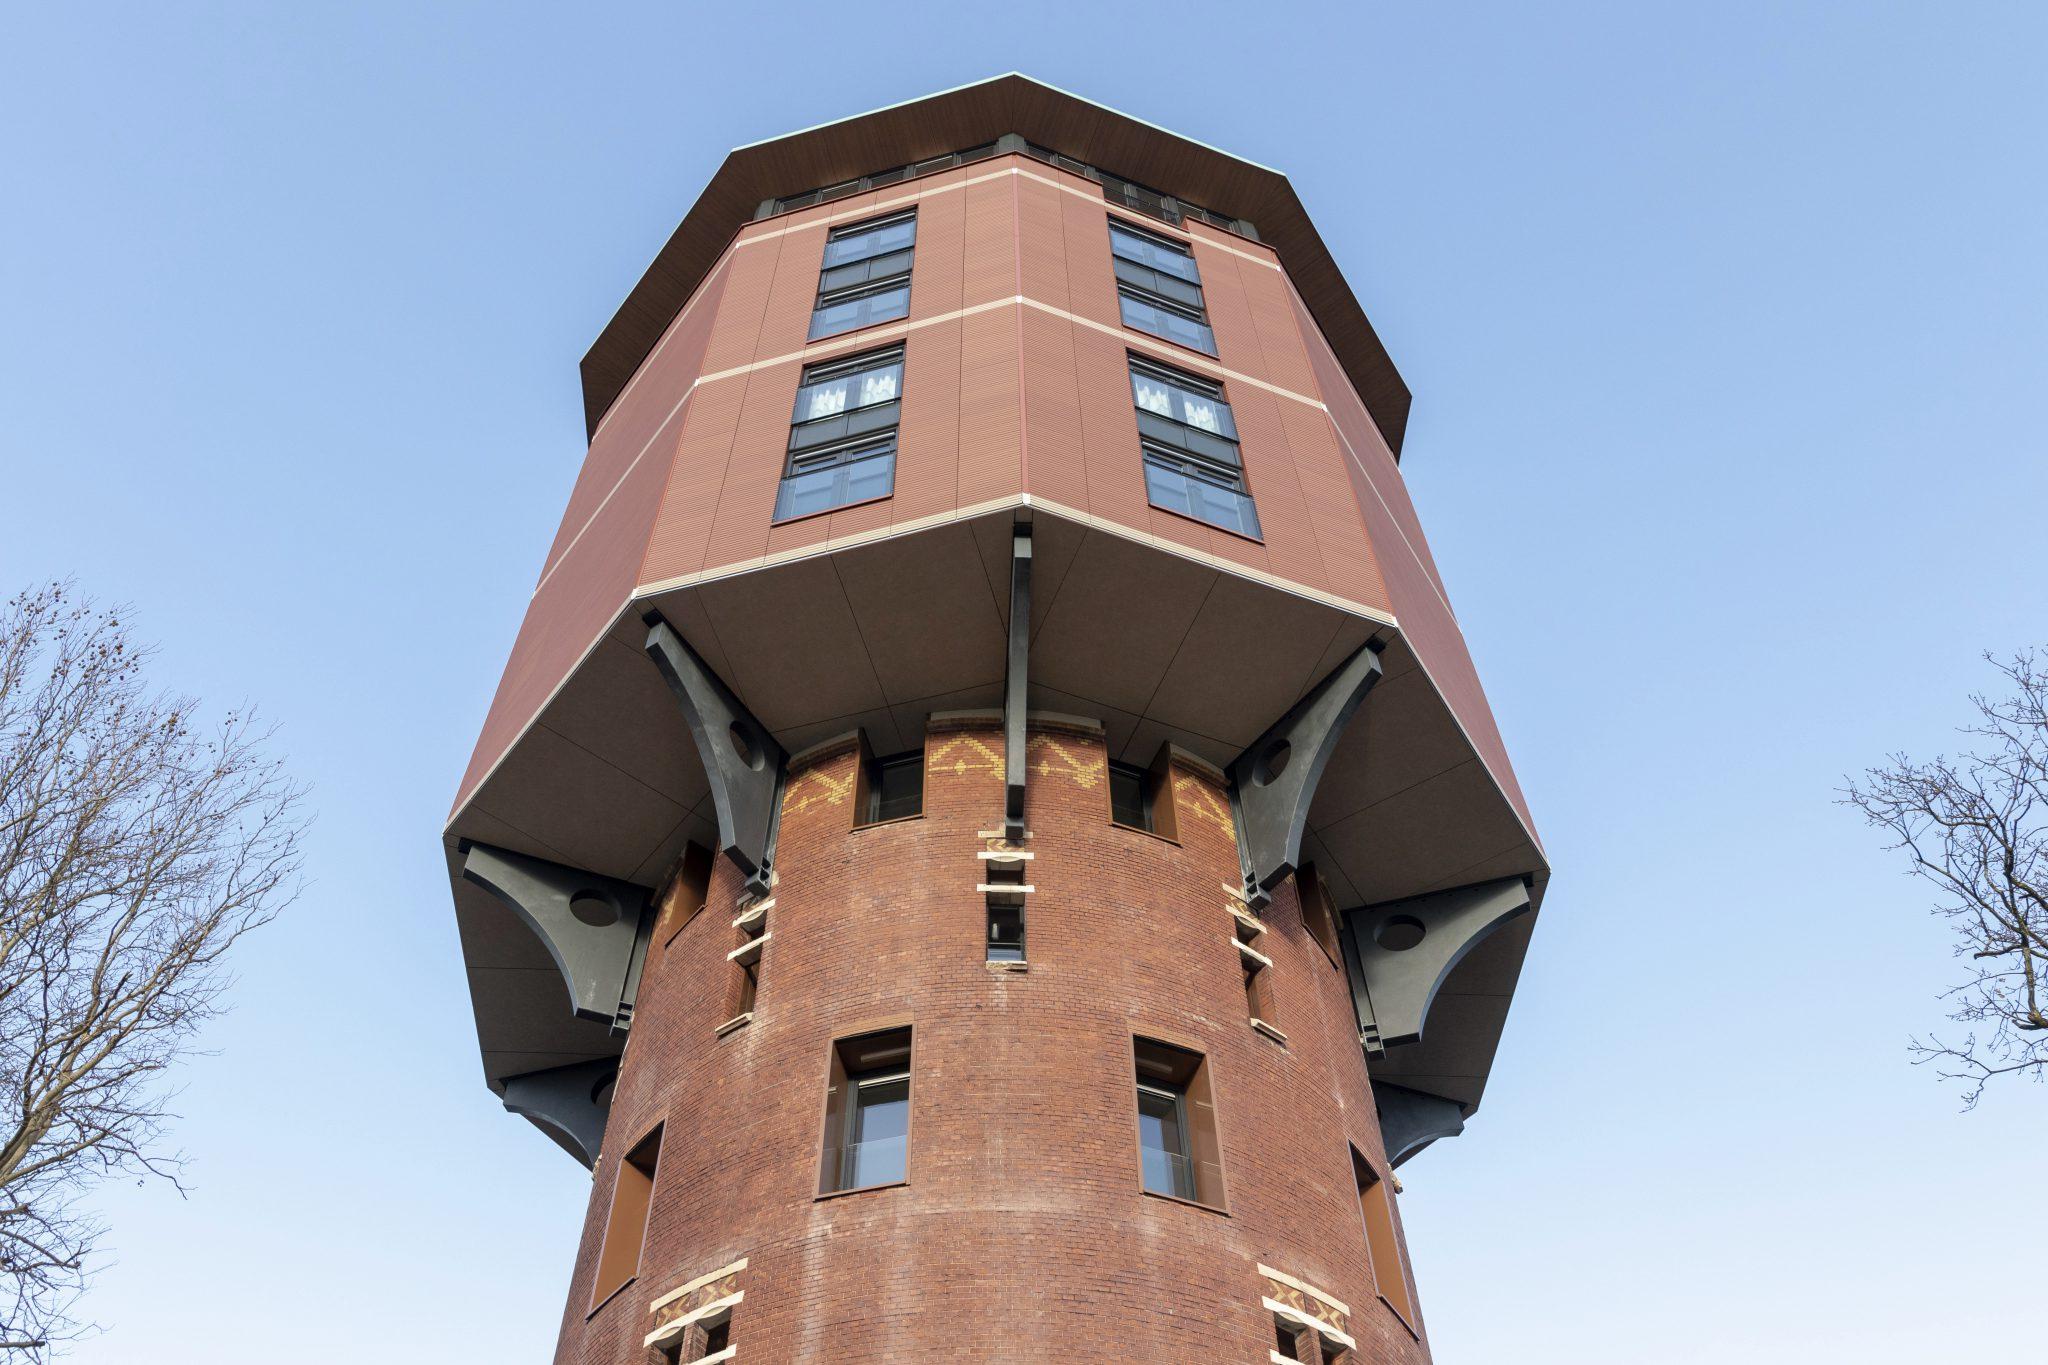 woonwatertoren, watertoren zwolle